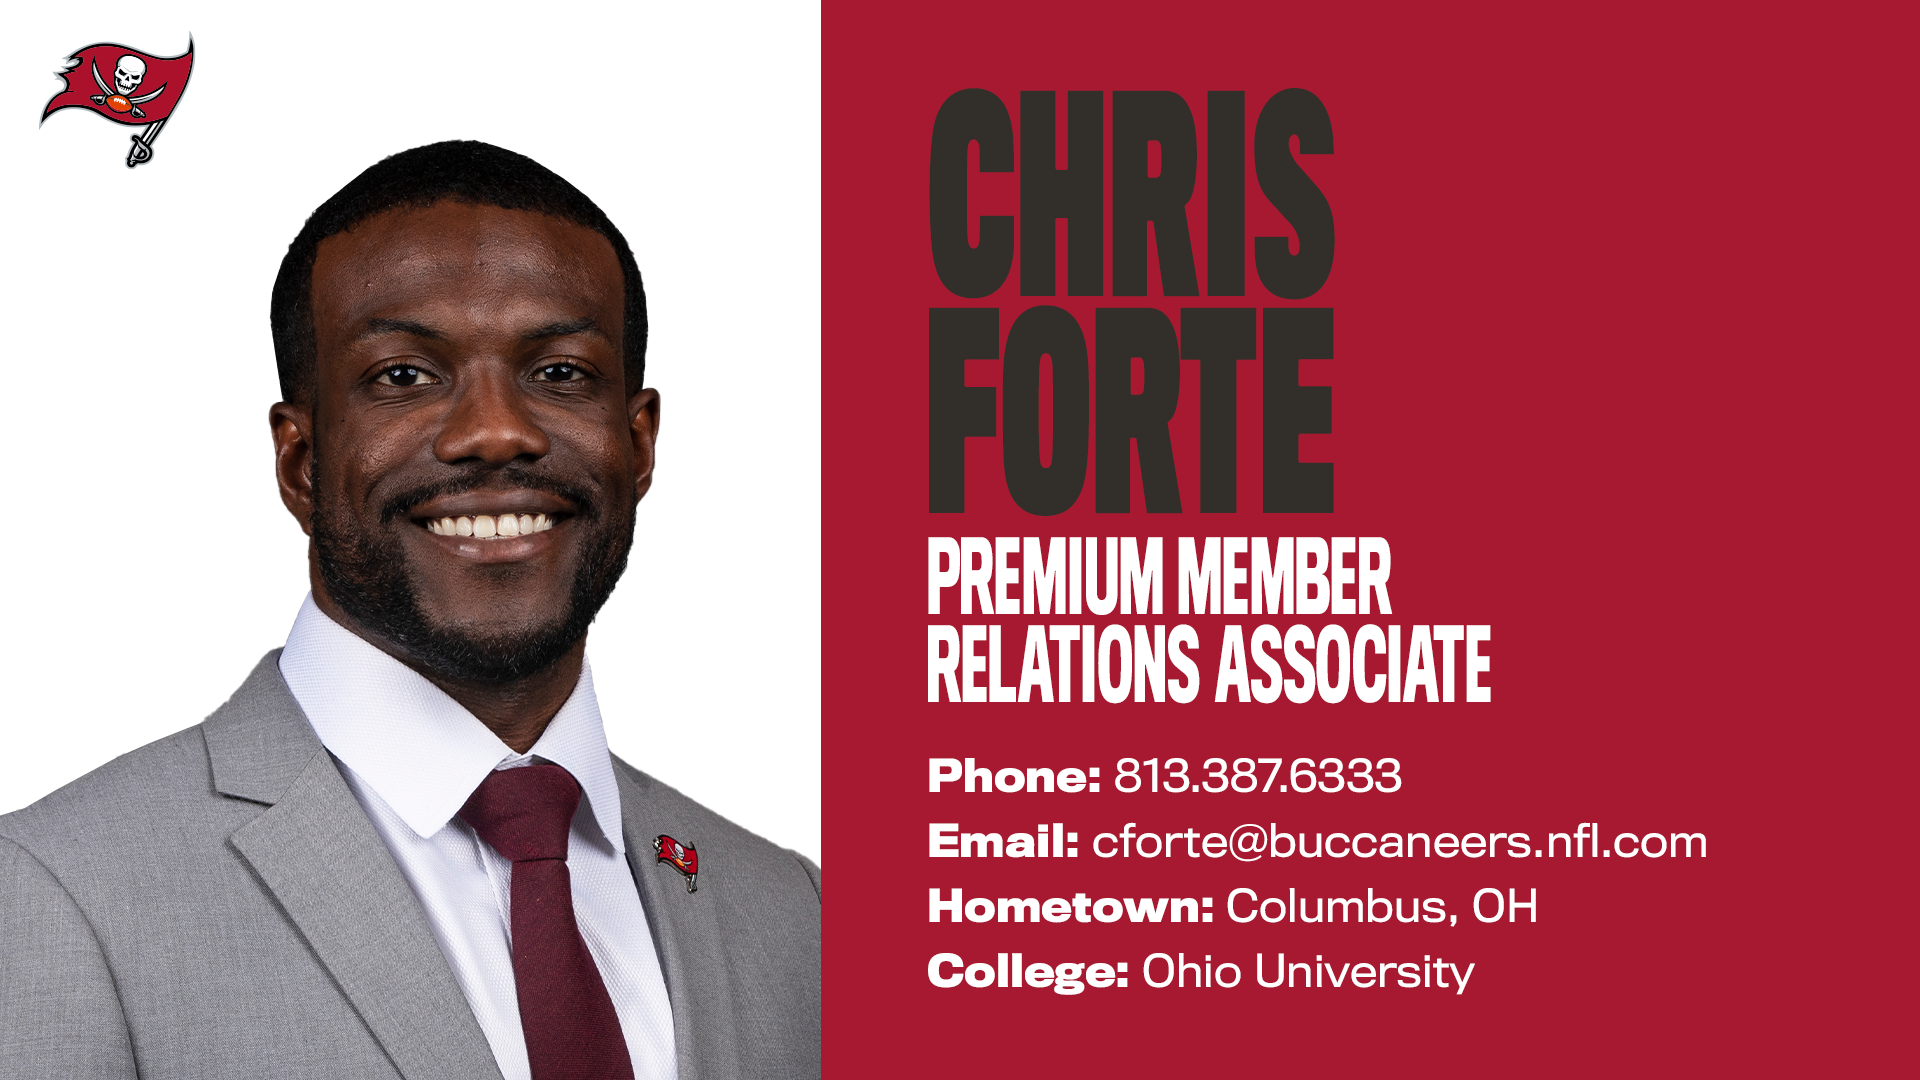 Chris Forte